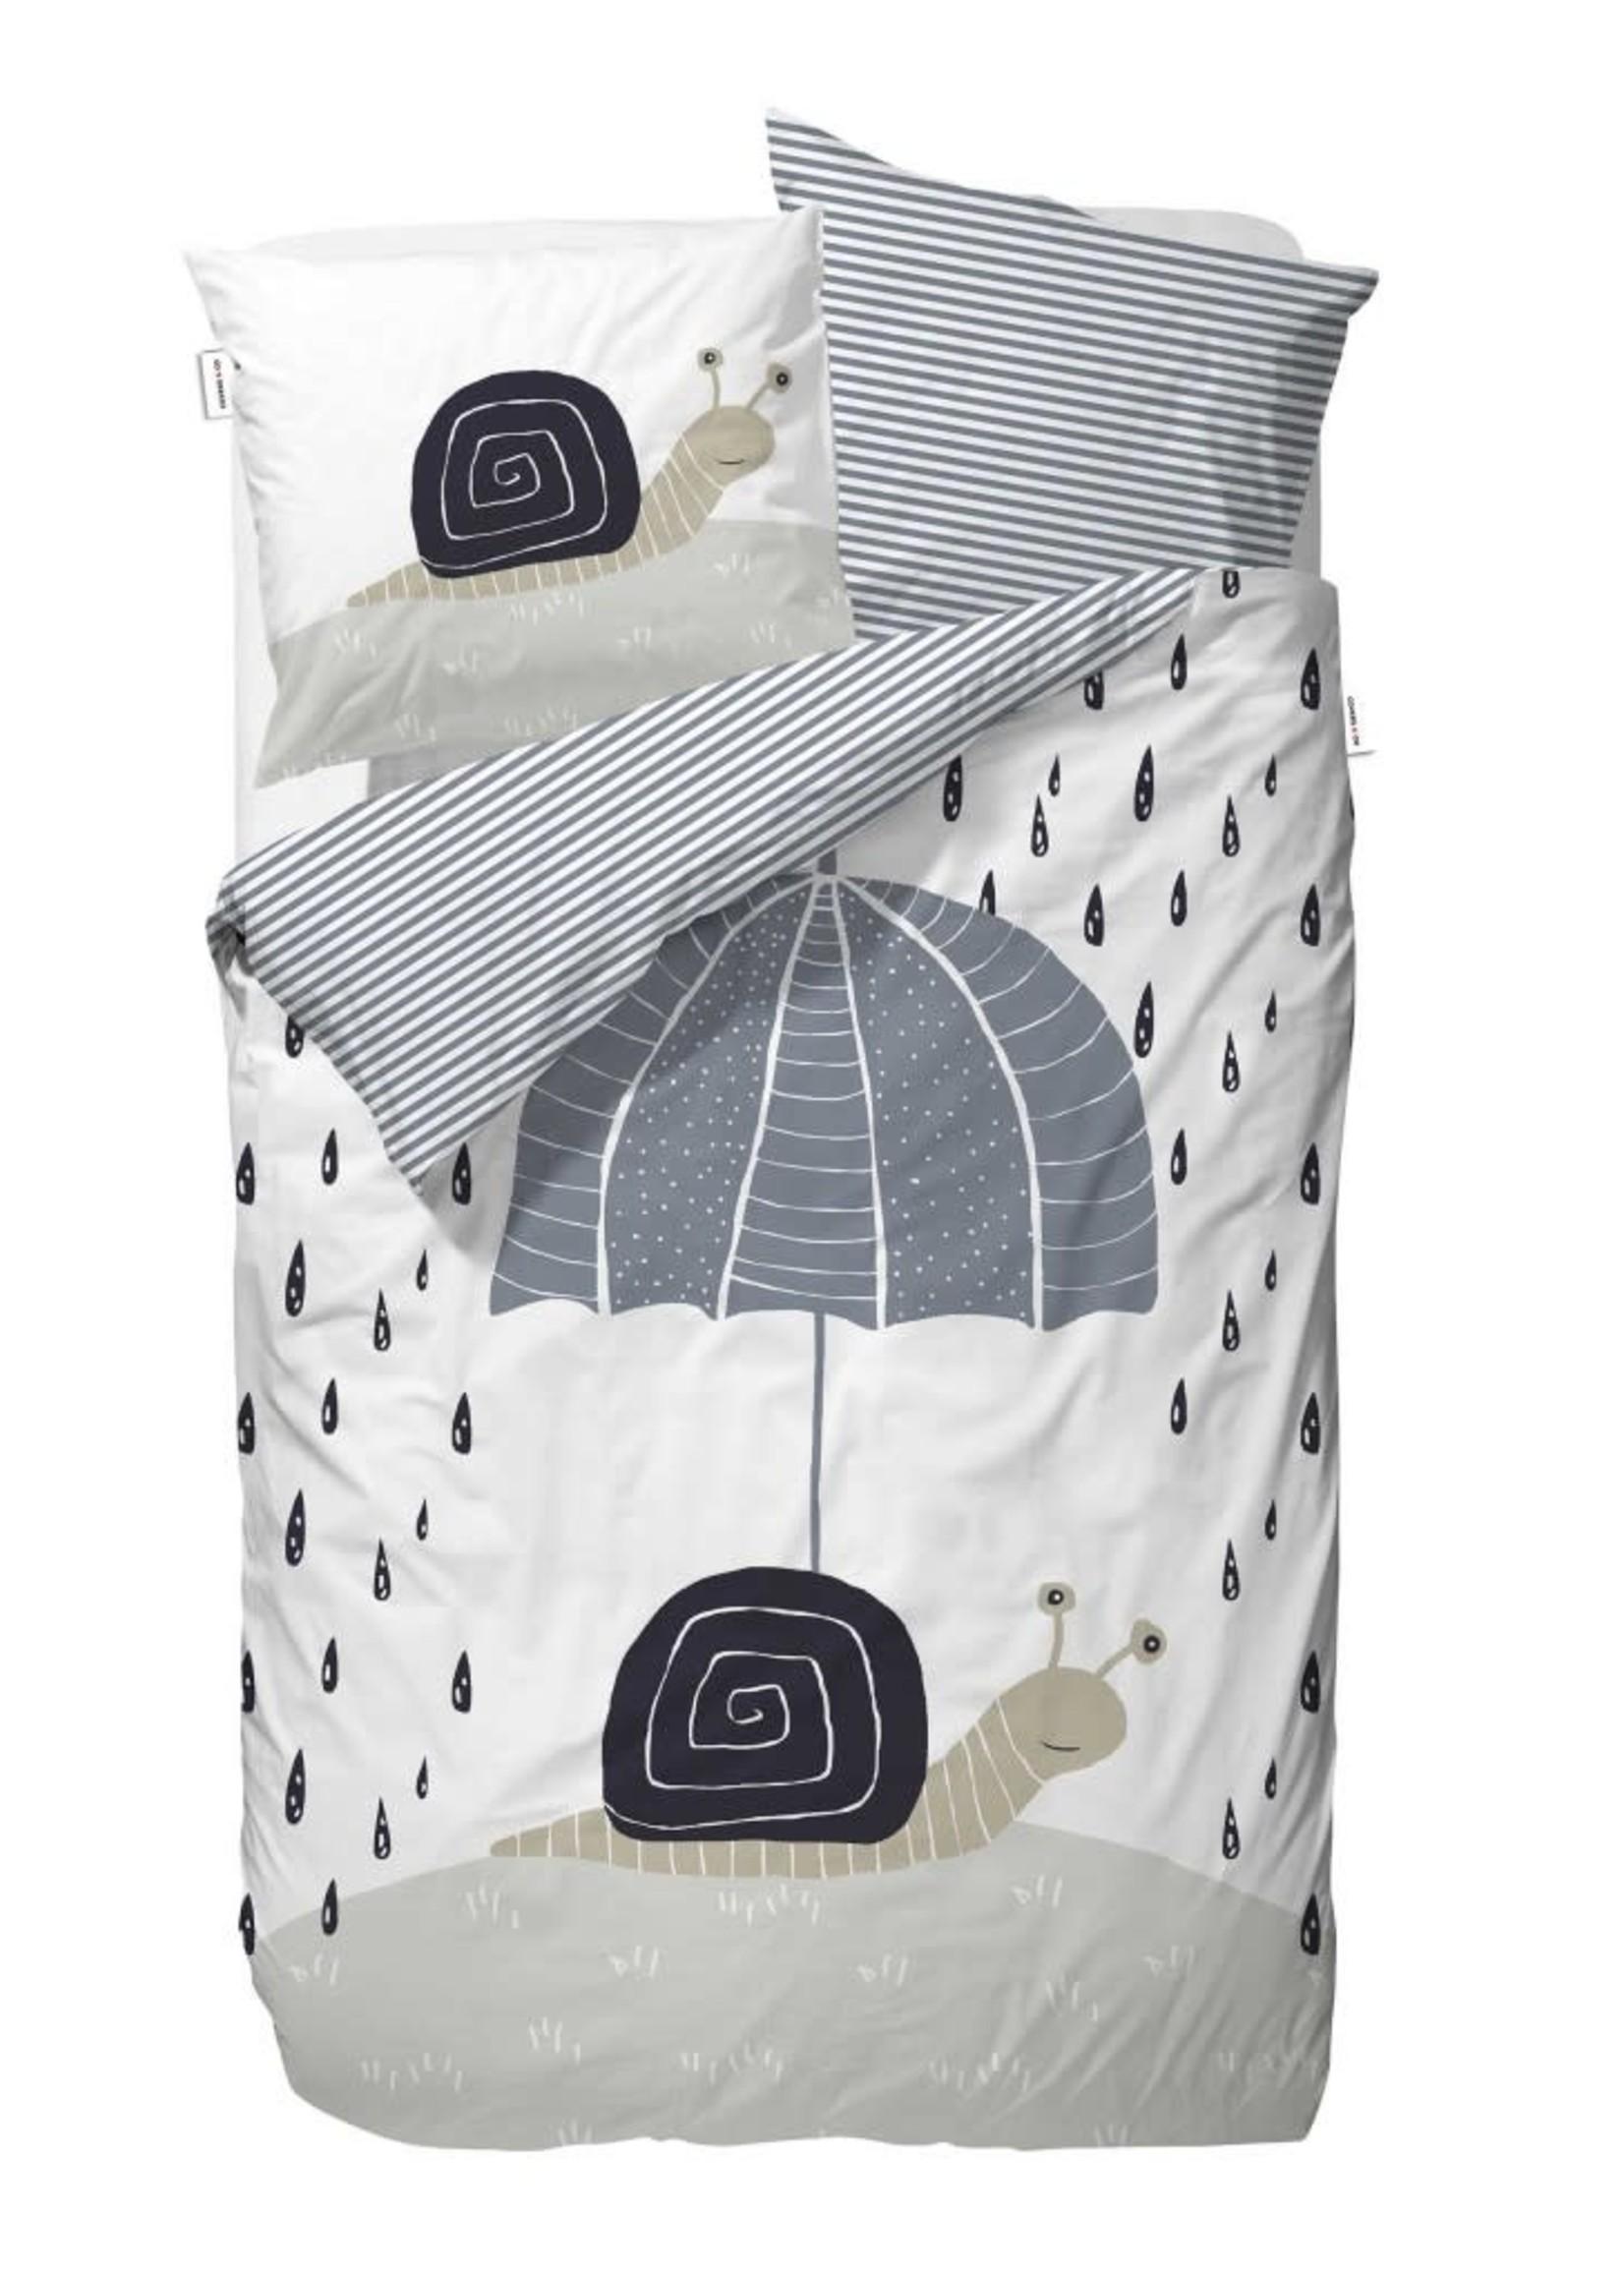 RAIN 140x220 beddengoed